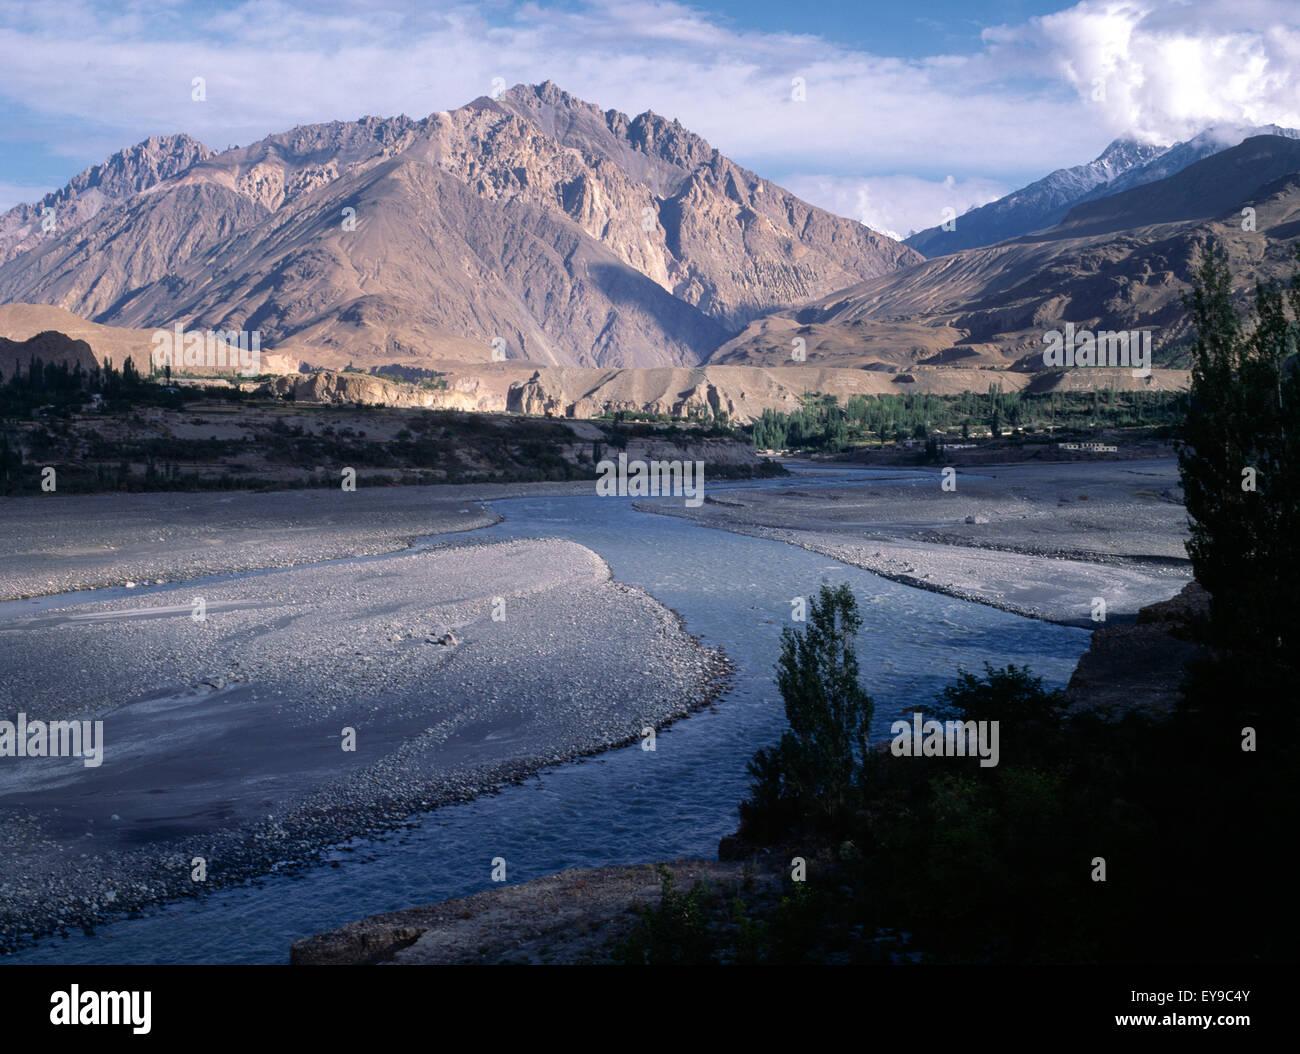 Northern Areas Pakistan Gojal Region Near Passu Hunza River Fed By Glacier Melt Stock Photo